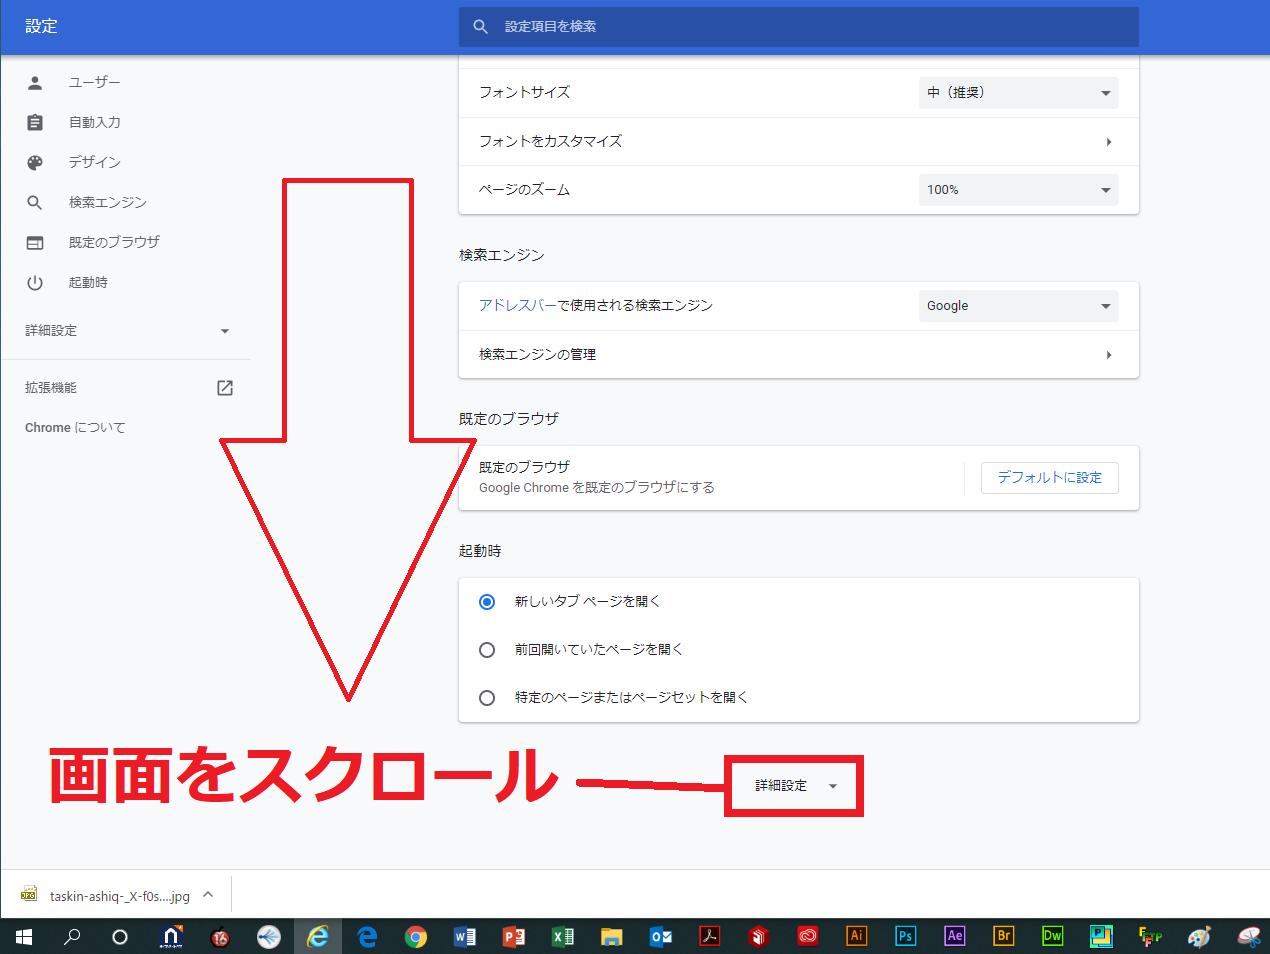 f:id:shokochun:20191224105221p:plain